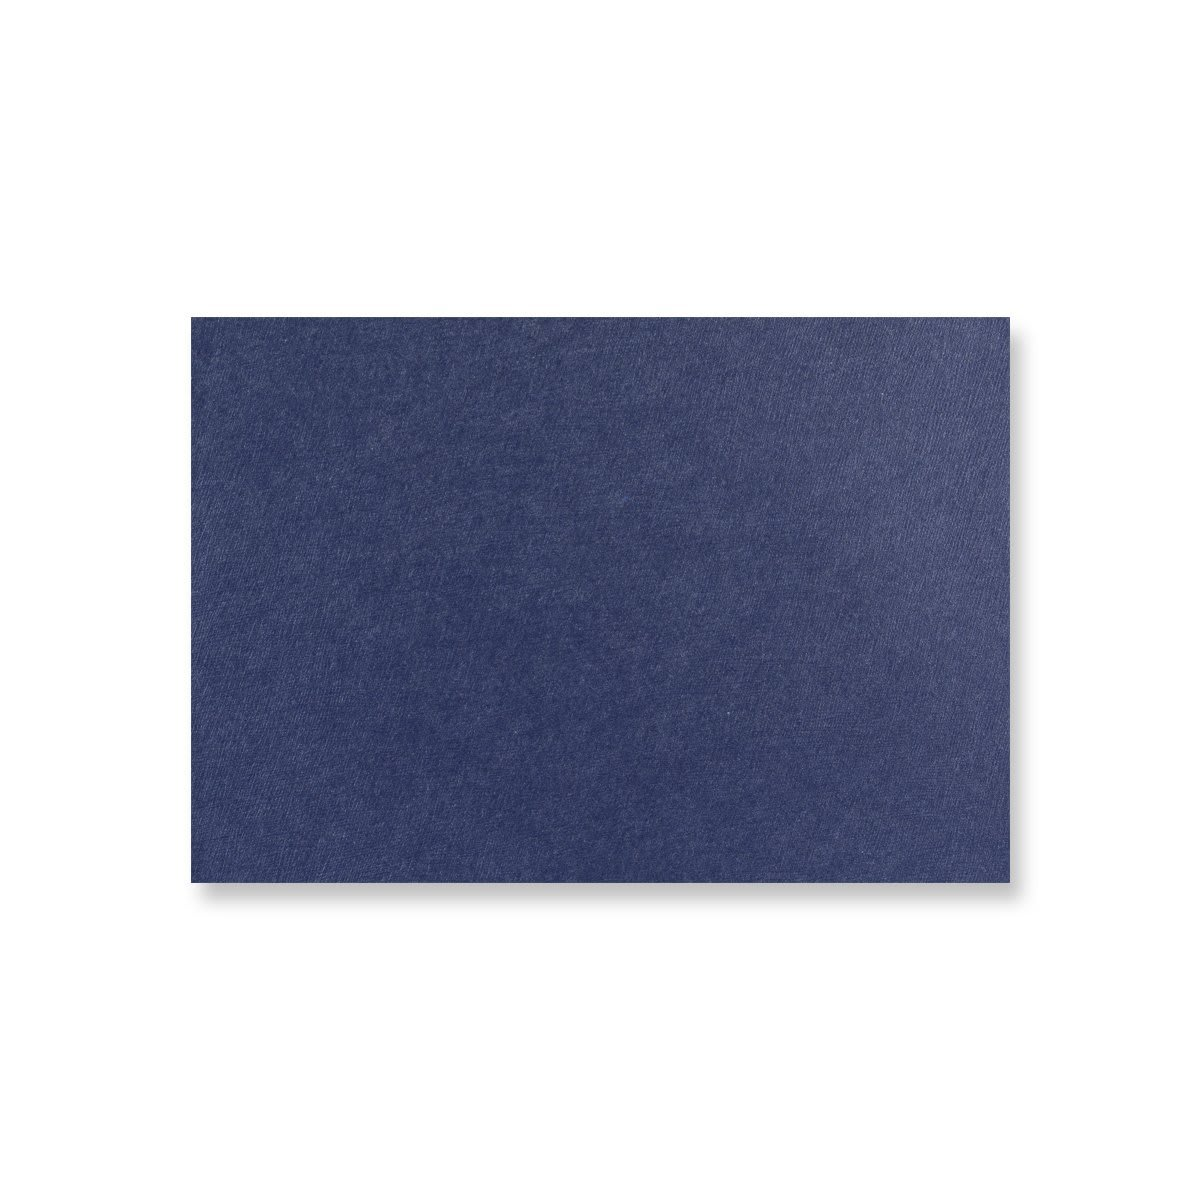 C6 MIDNIGHT BLUE BUTTERFLY ENVELOPES